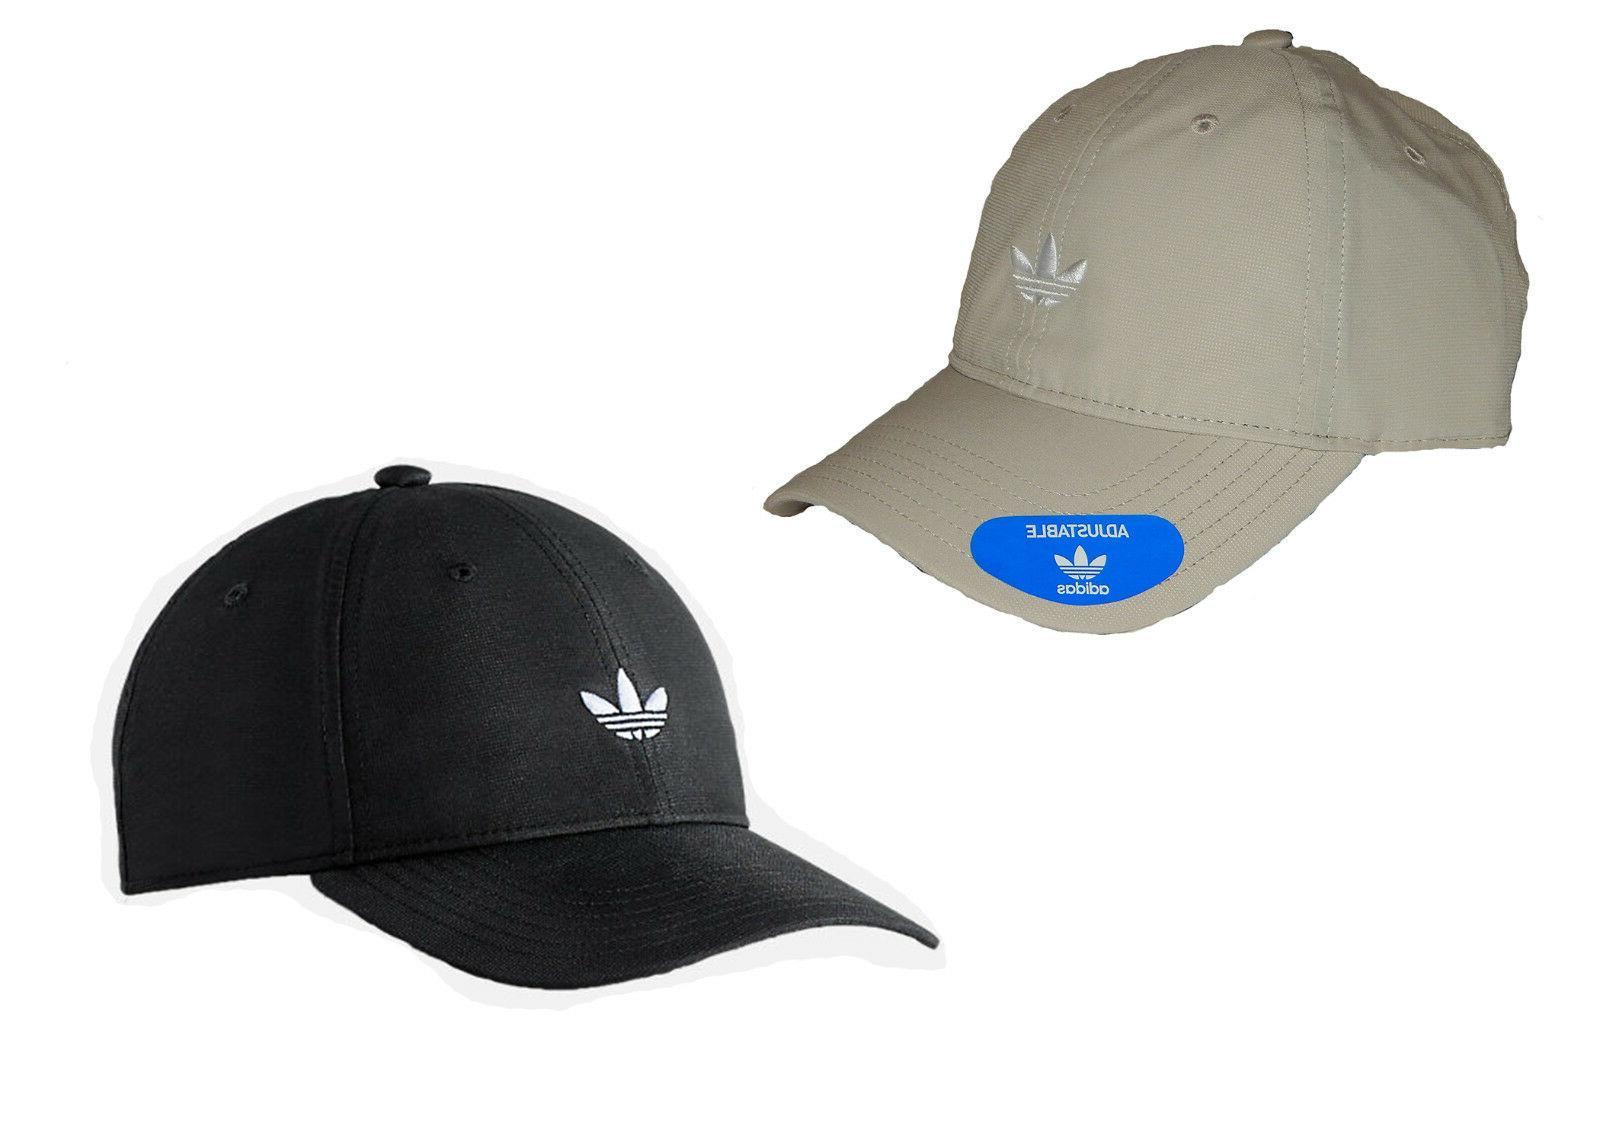 Adidas Originals Modern Relaxed Hat / Cap NEW Trefoil Strapb